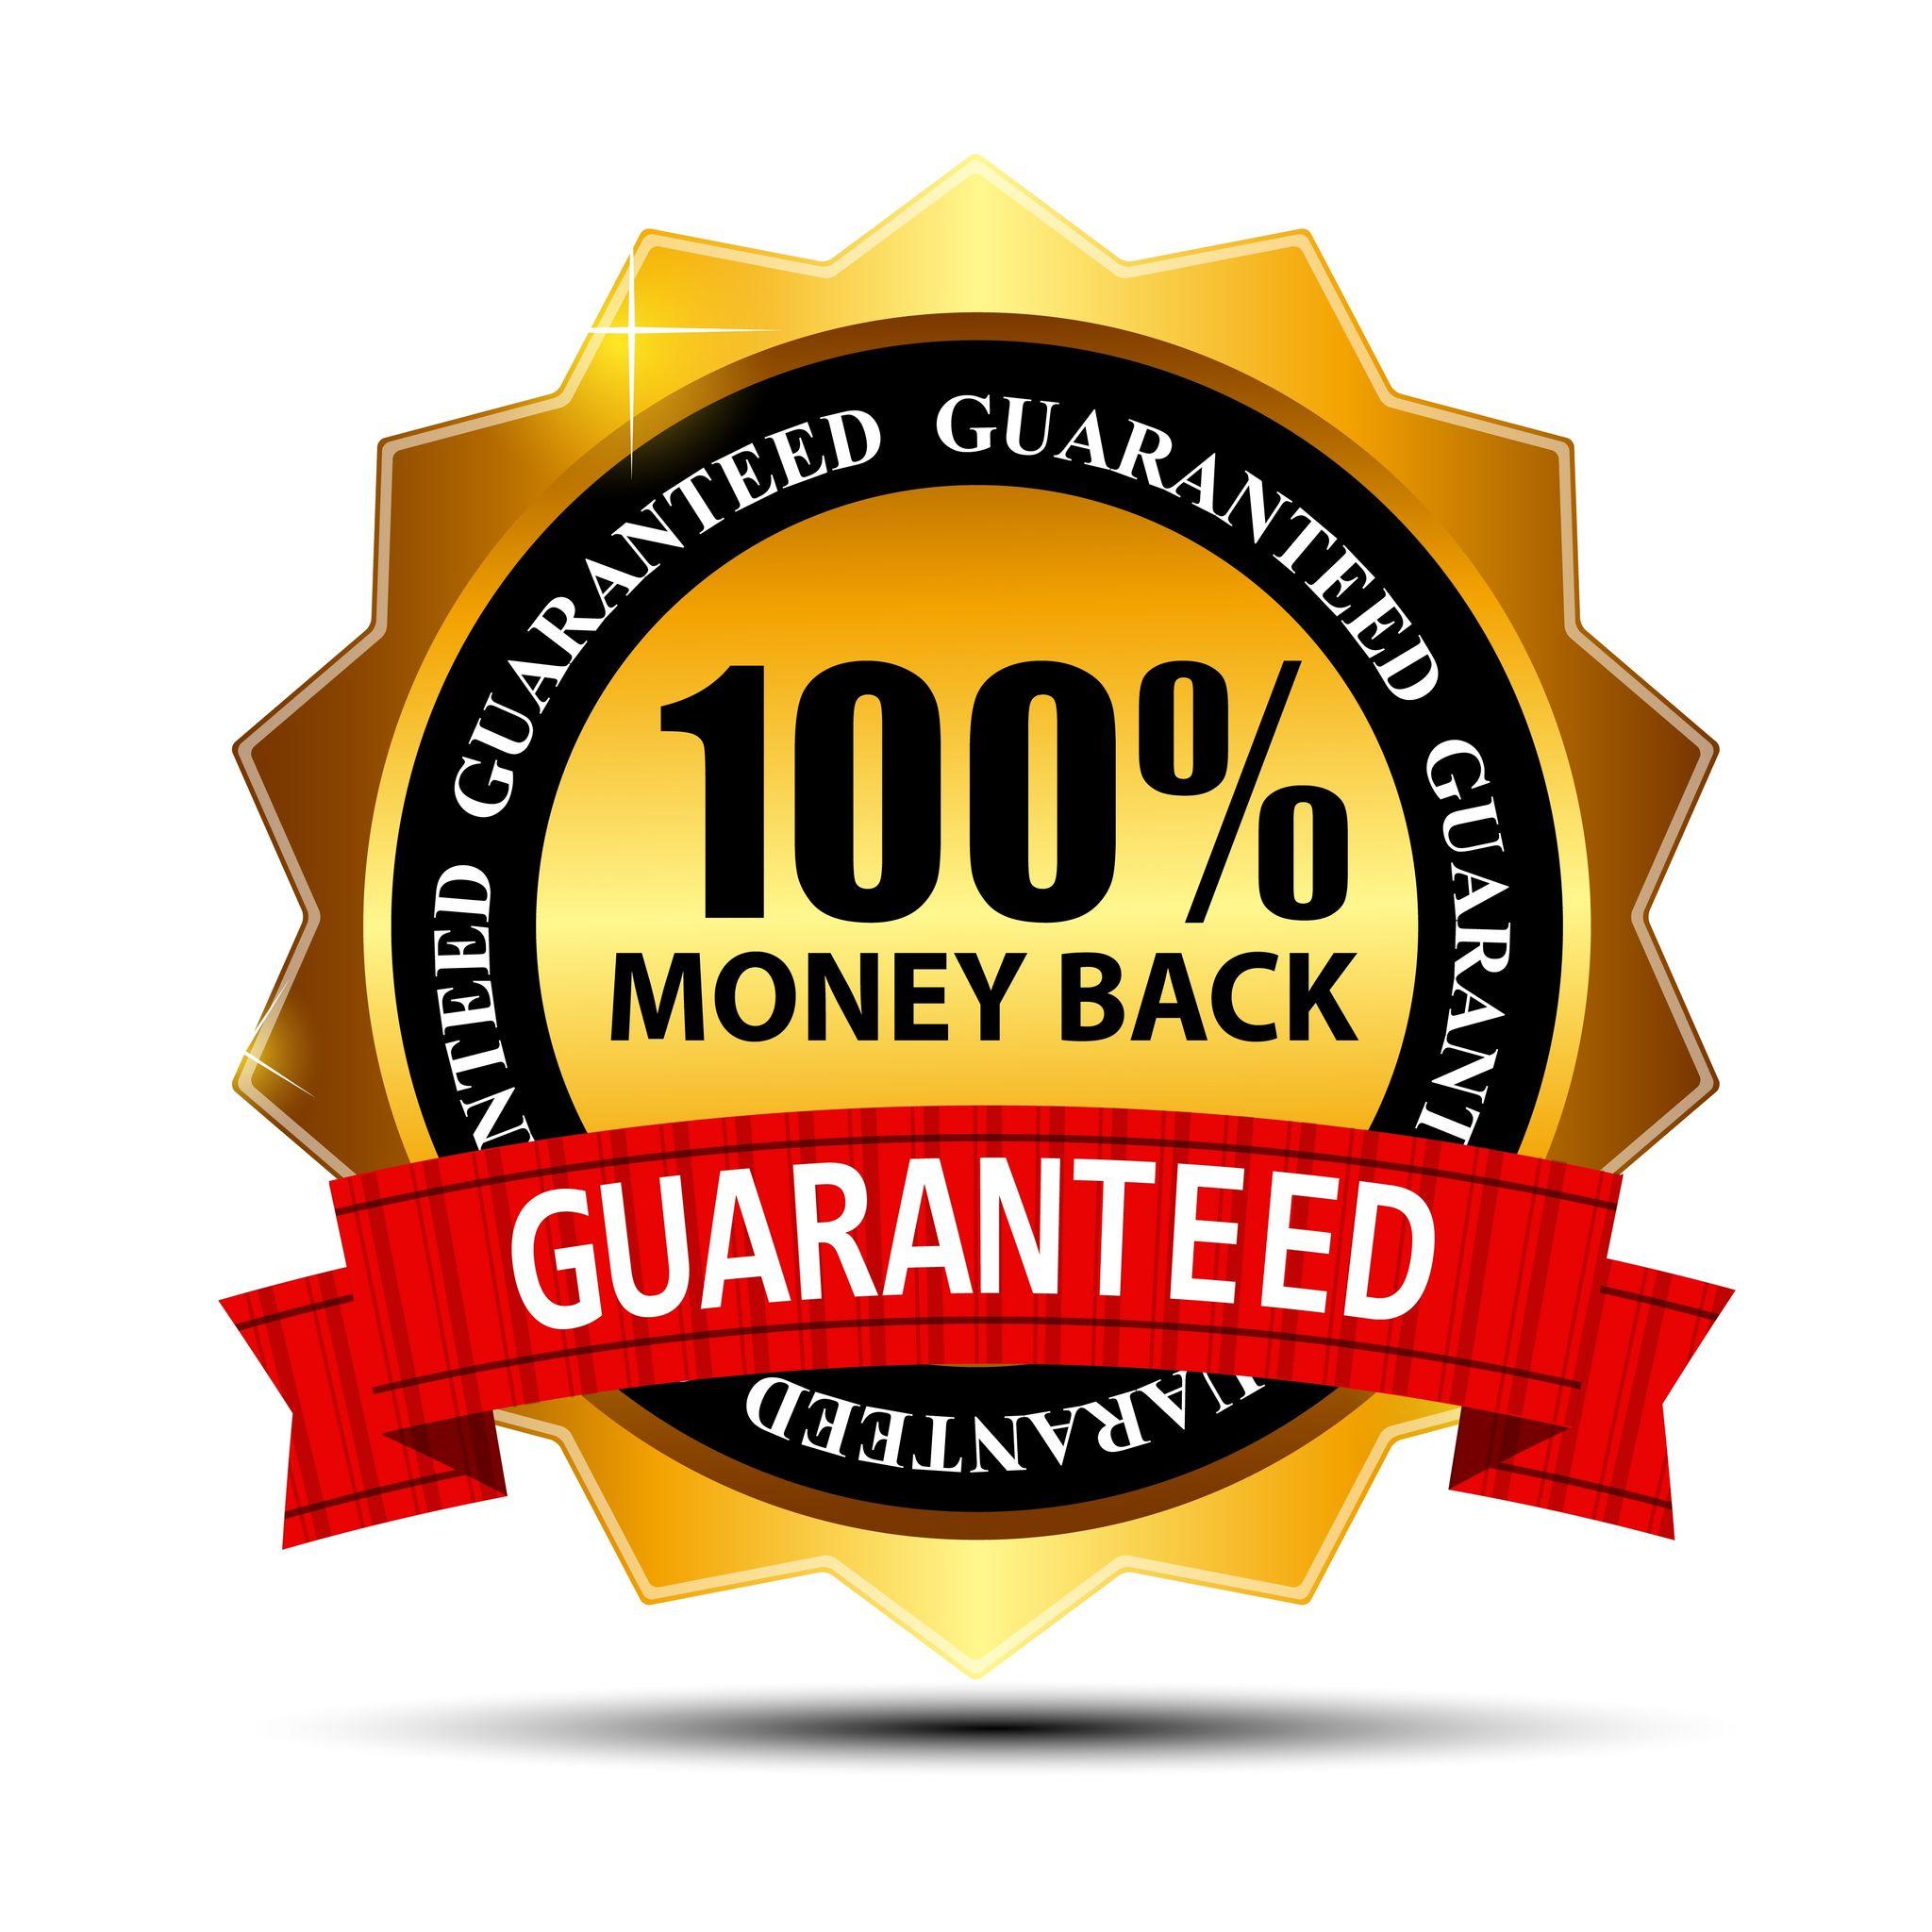 10 Day Money Back Guarantee